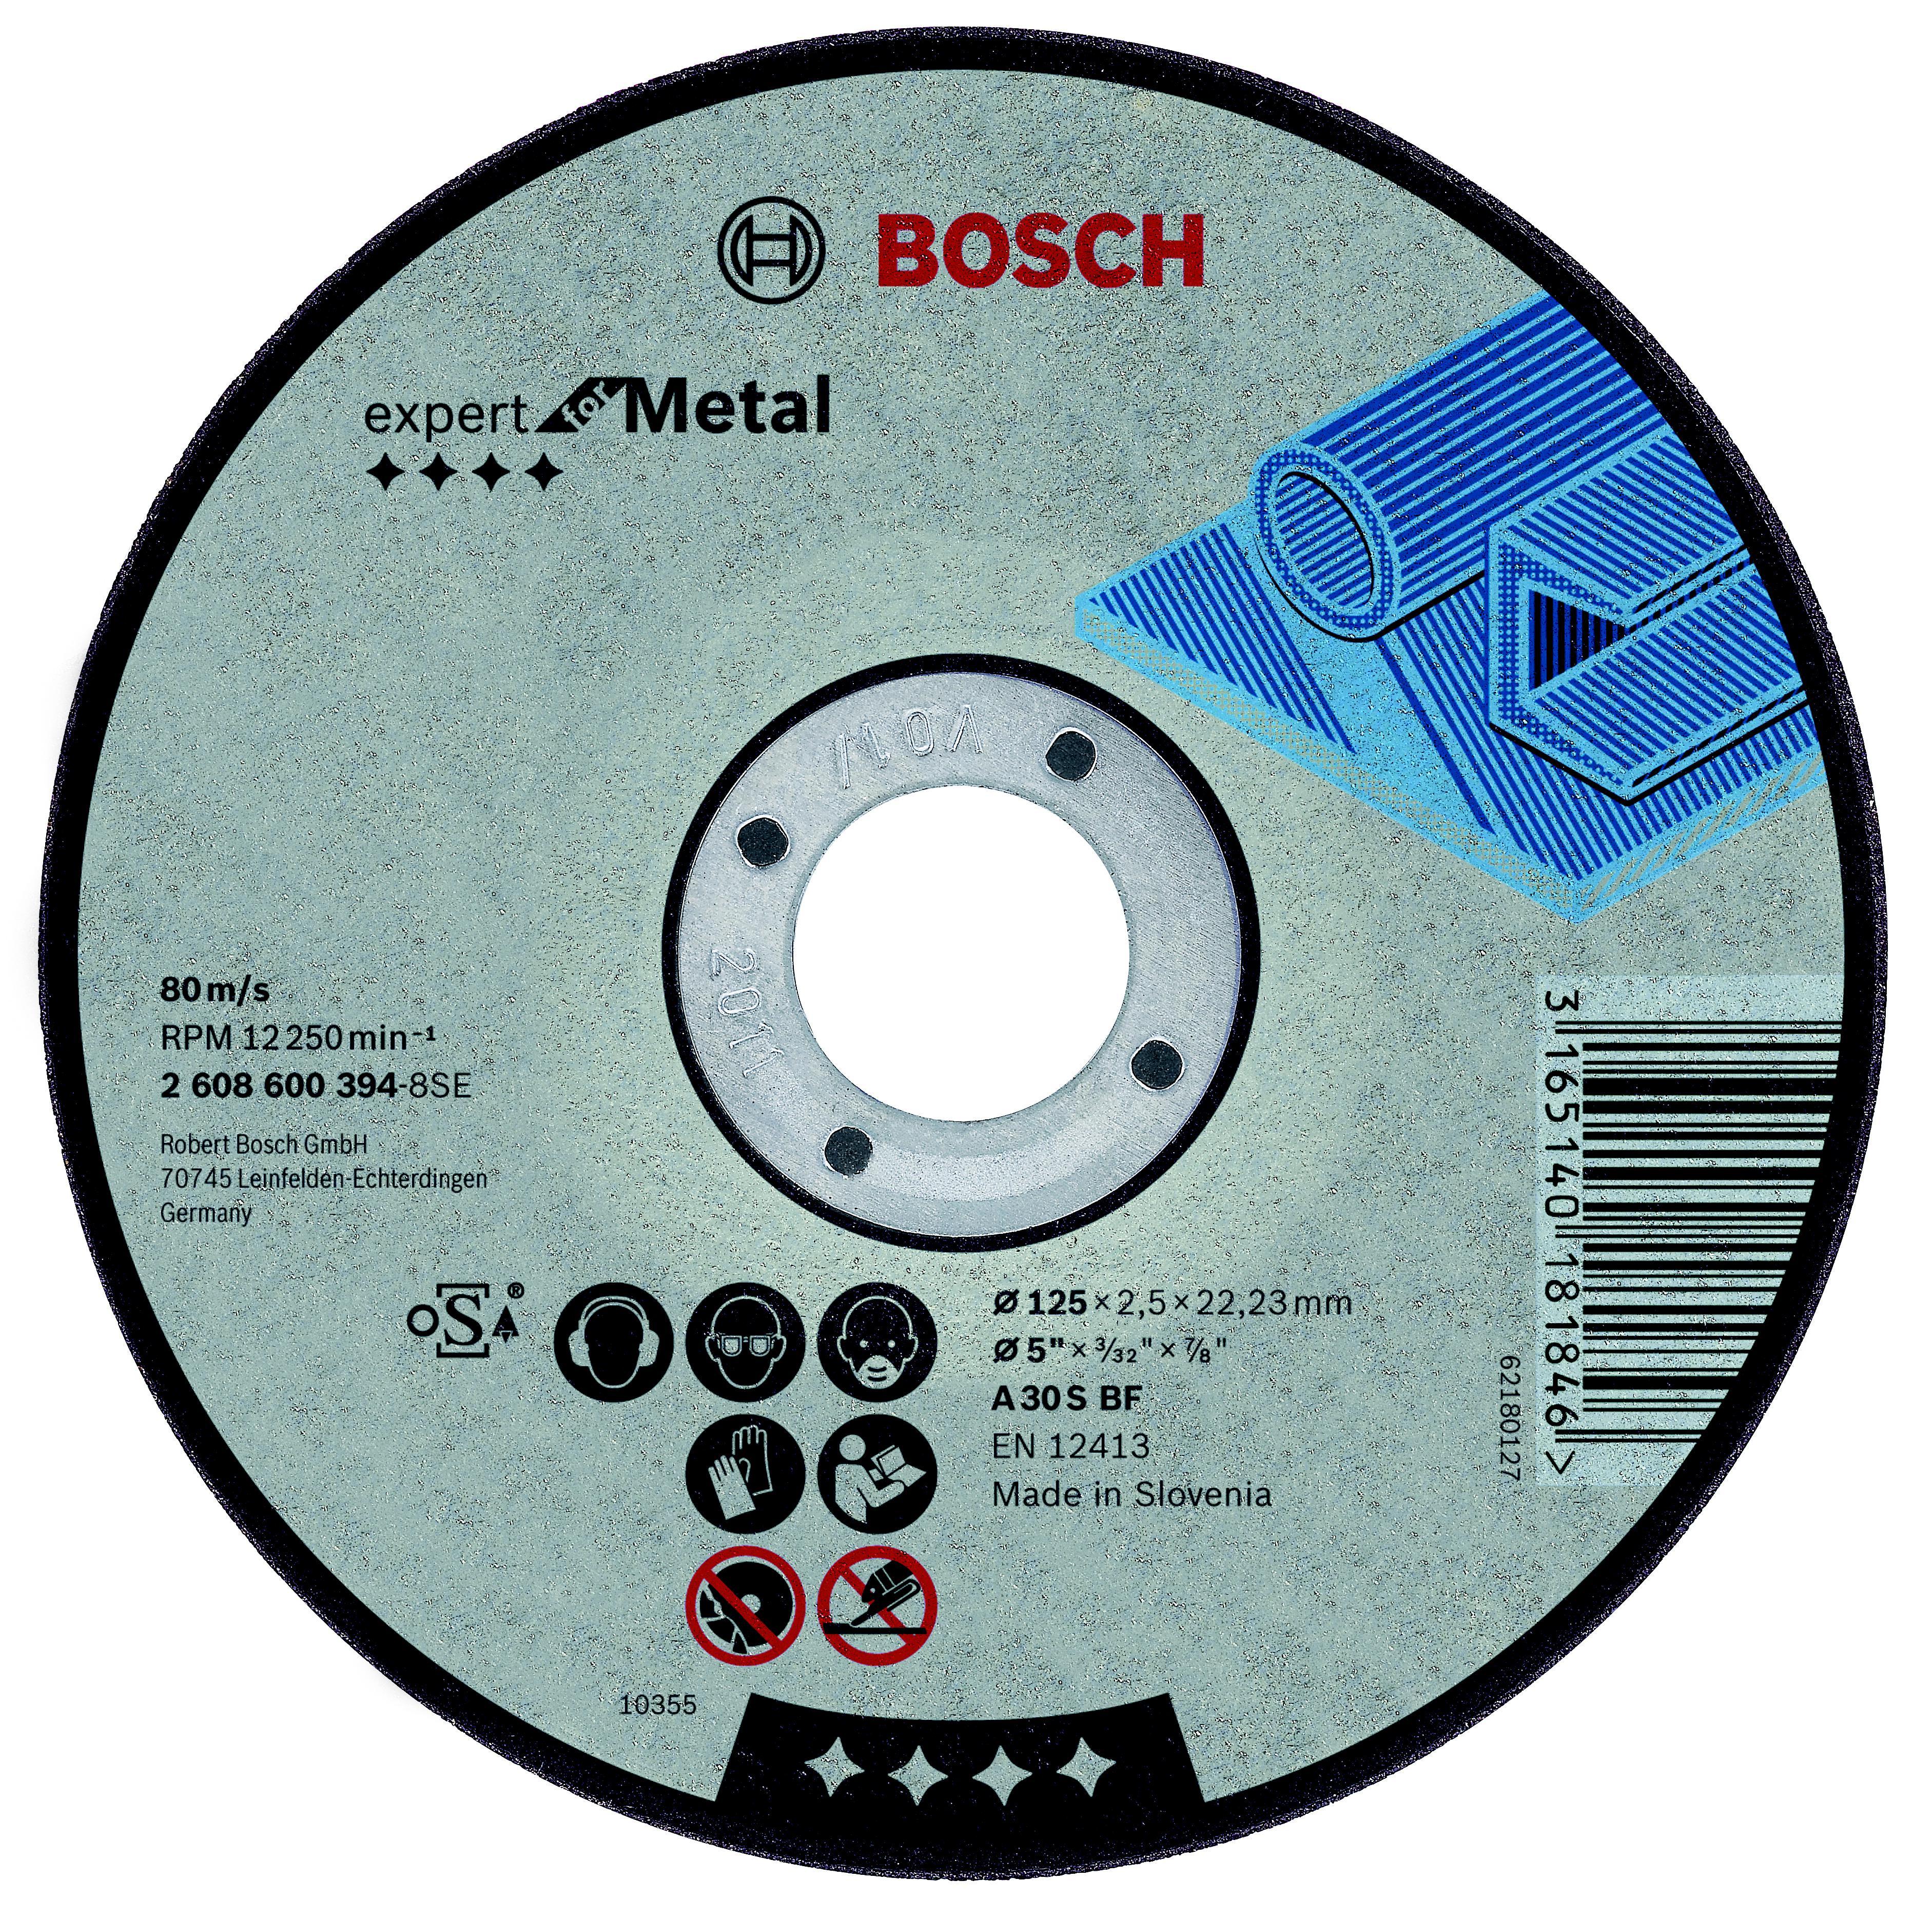 Круг отрезной Bosch 115х2.5х22 expert for metal (2.608.600.318) круг отрезной bosch expert for metal 230x1 9x22 2 608 603 400